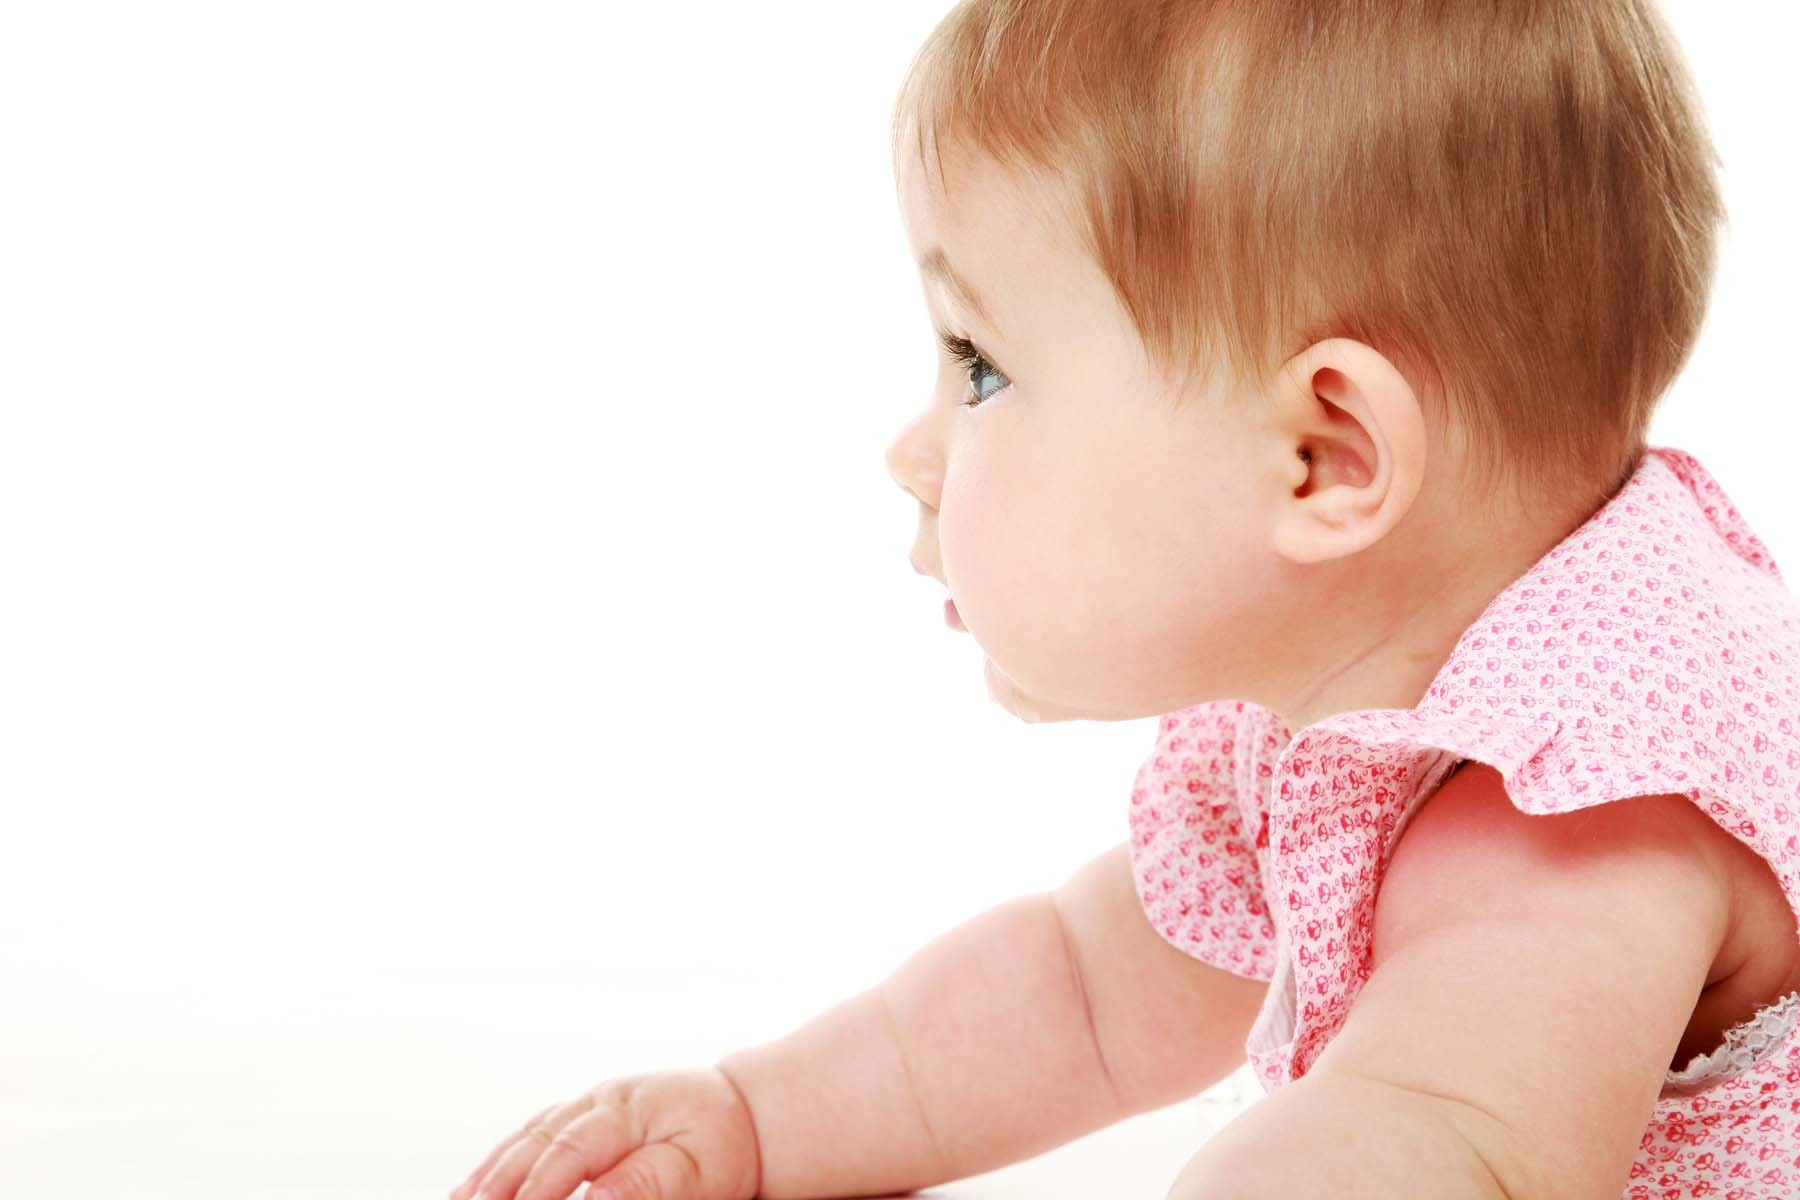 Newborn Baby Photographer in Sussex & Surrey, East Grinstead & Crawley (23)